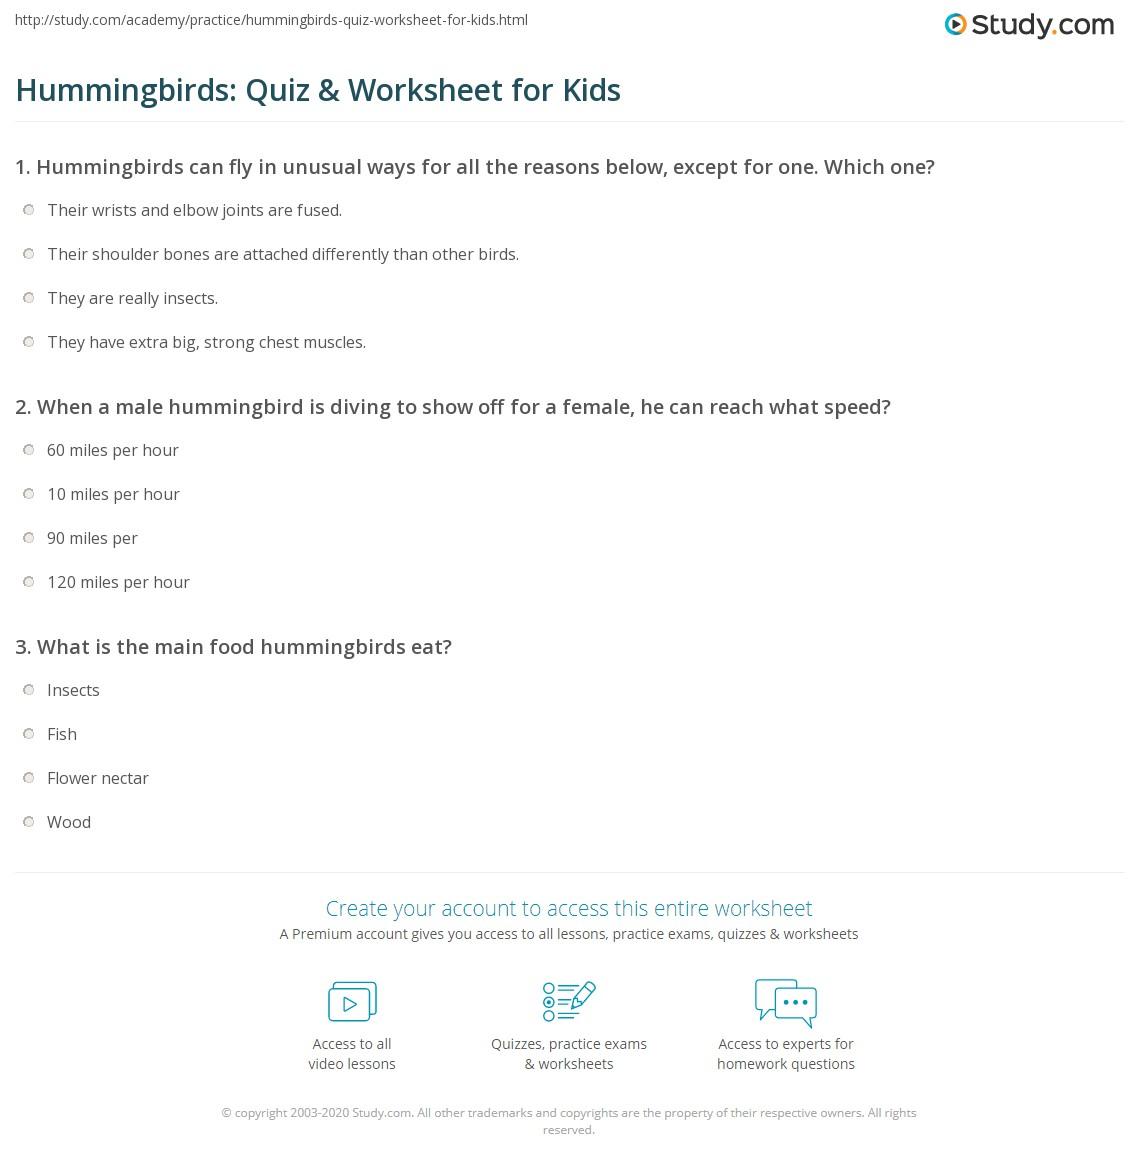 Hummingbirds Quiz Amp Worksheet For Kids